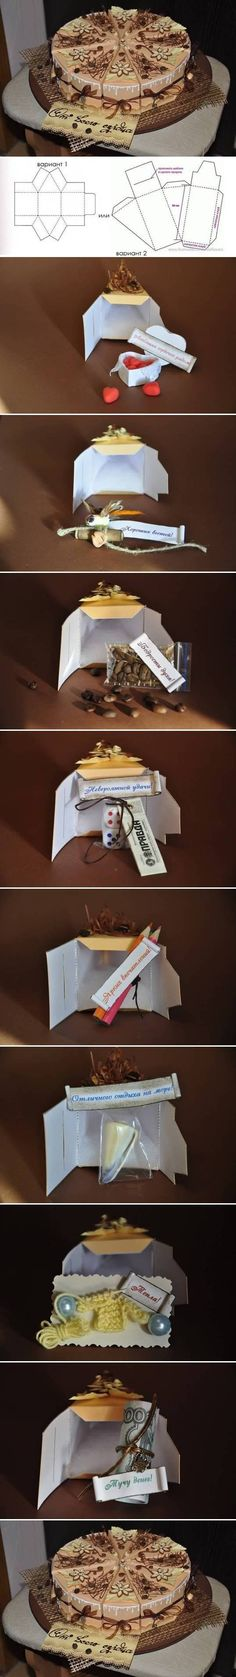 DIY Cake Gift Box Template DIY Projects | UsefulDIY.com Follow us on Facebook ==> https://www.facebook.com/UsefulDiy